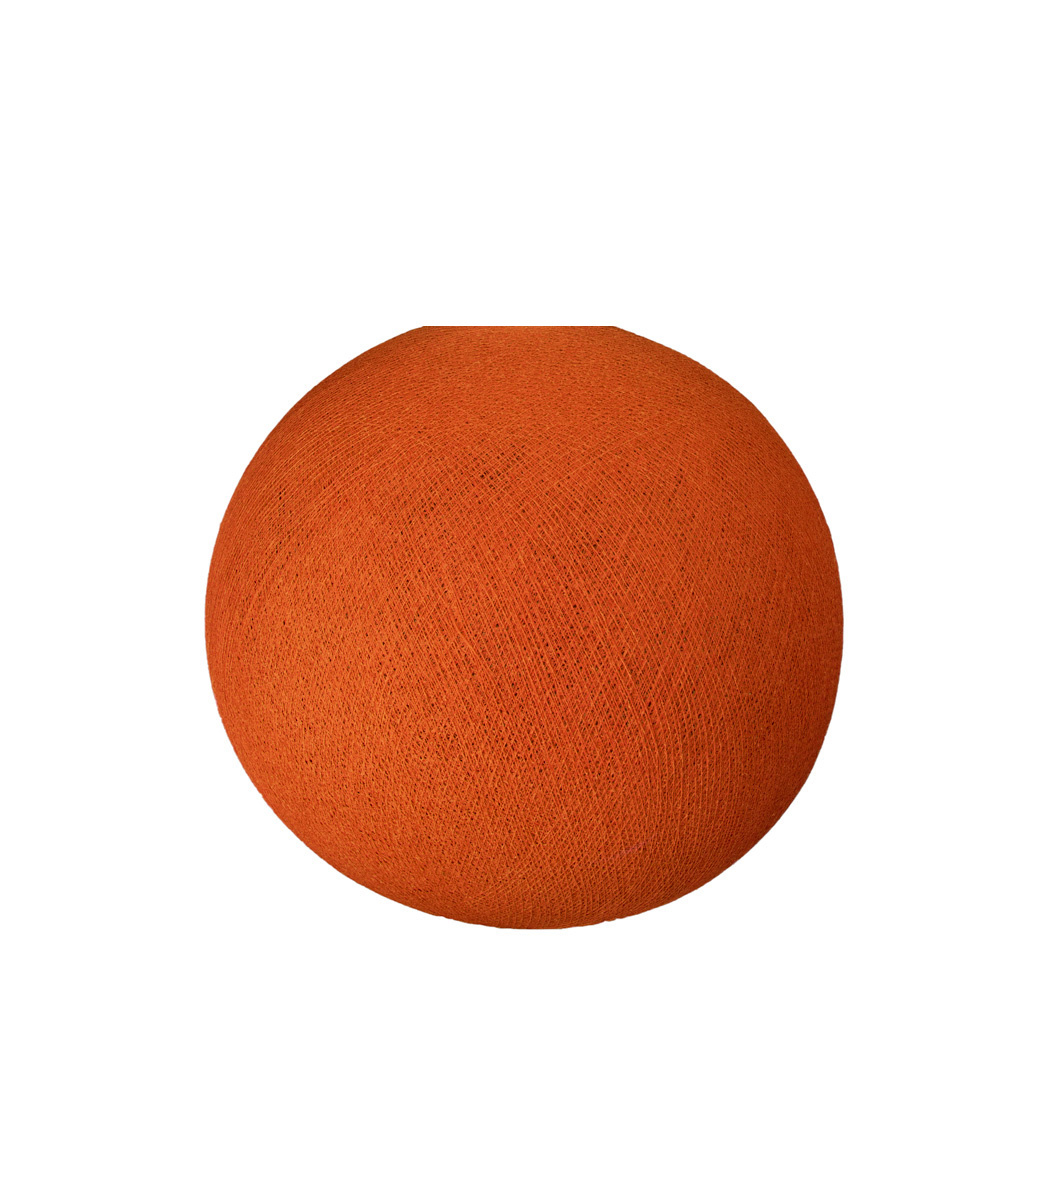 Dutch Orange - Full Round